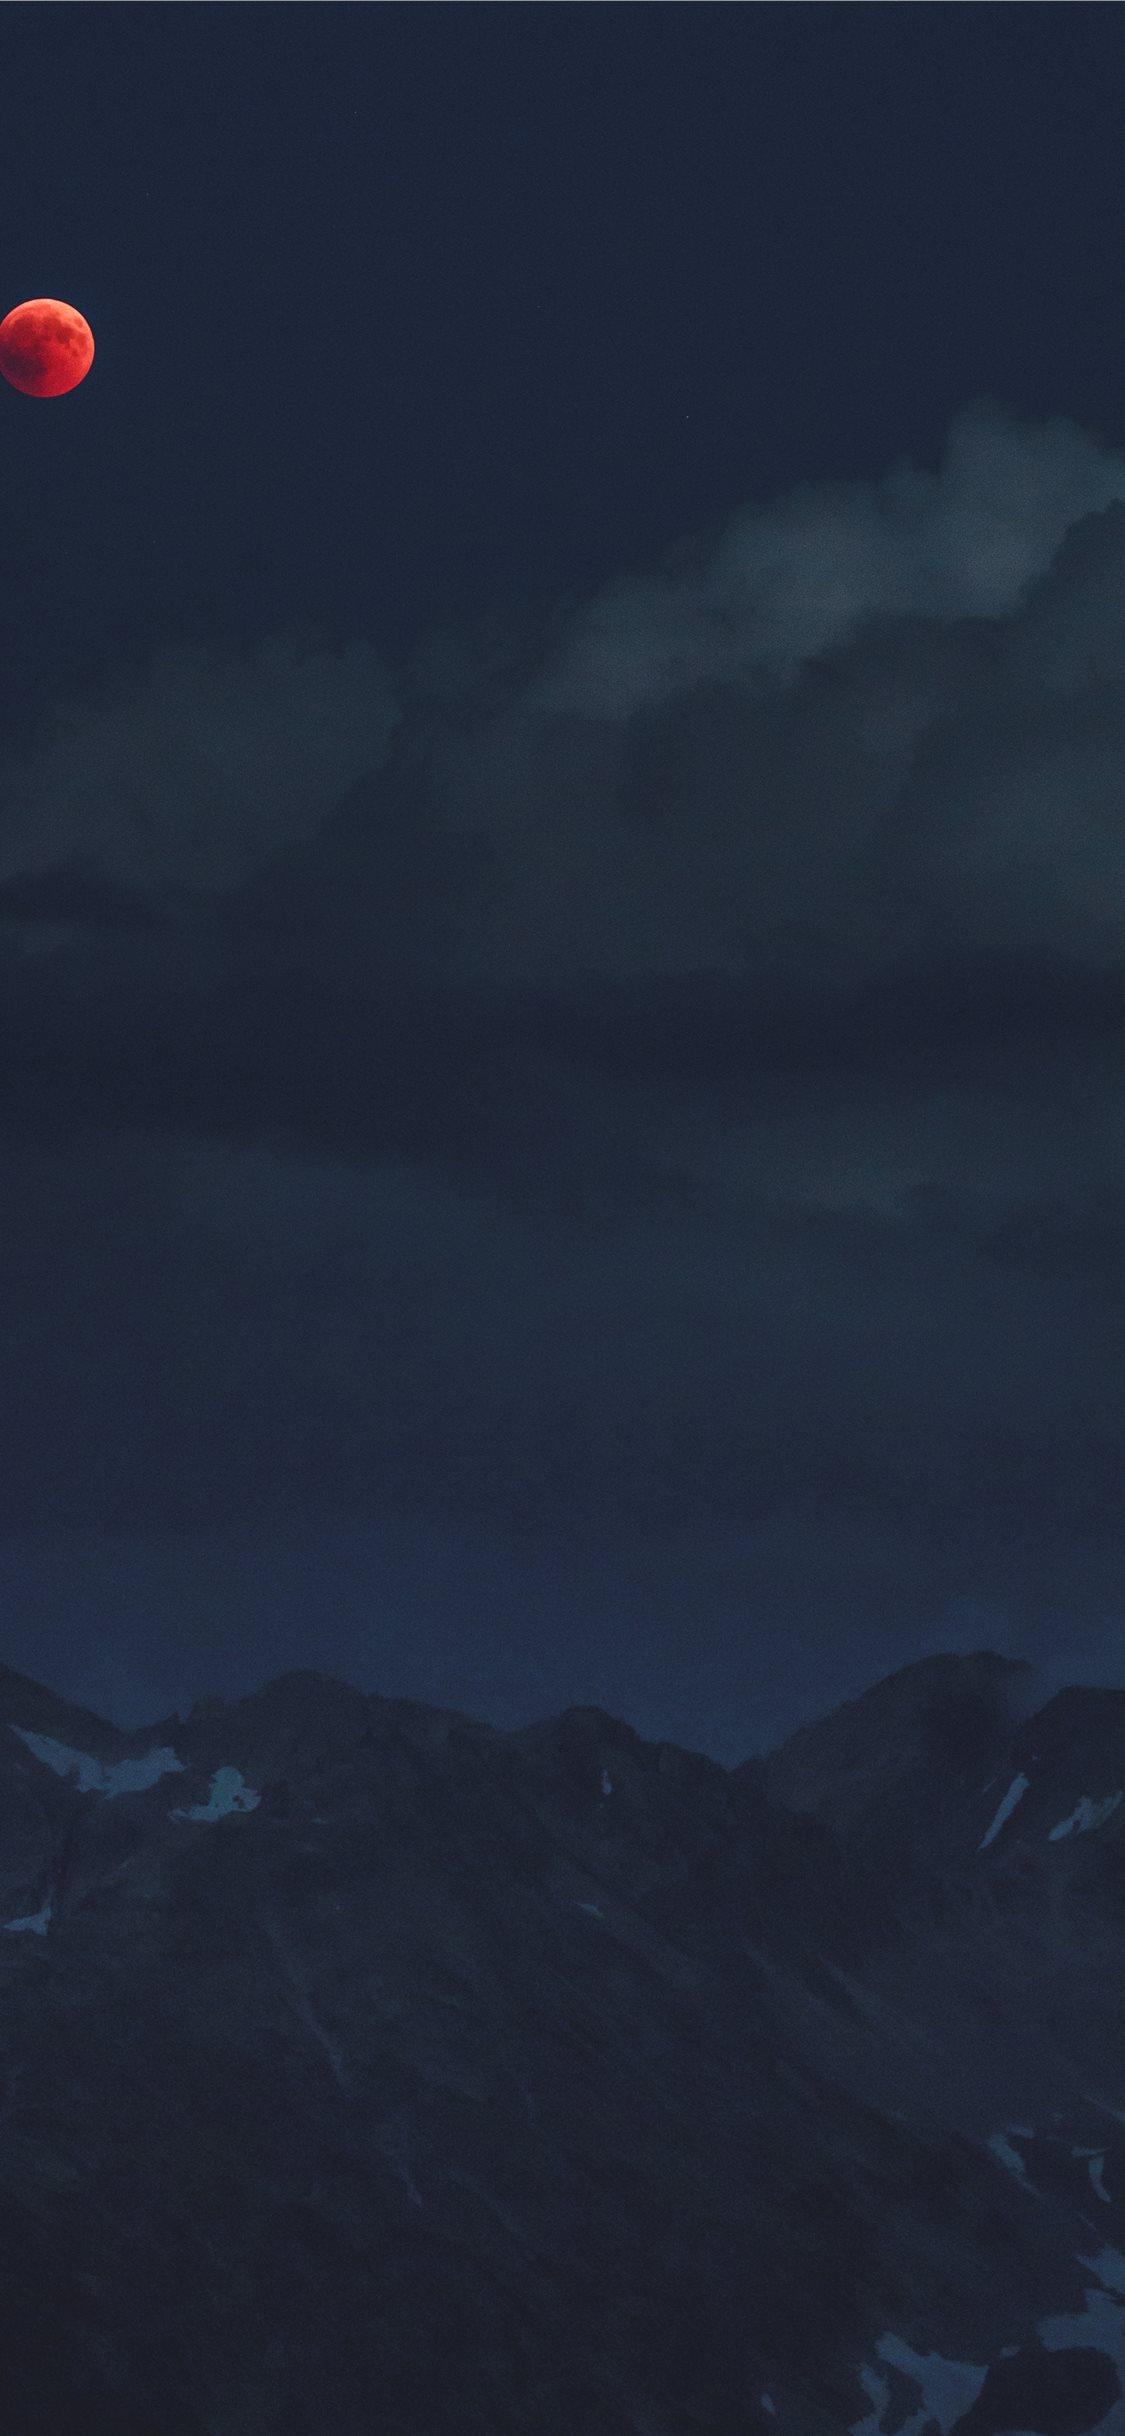 ed170b5b6de8 Blood Moon Over A Dark Mountain Iphone X Wallpaper Download Iphone